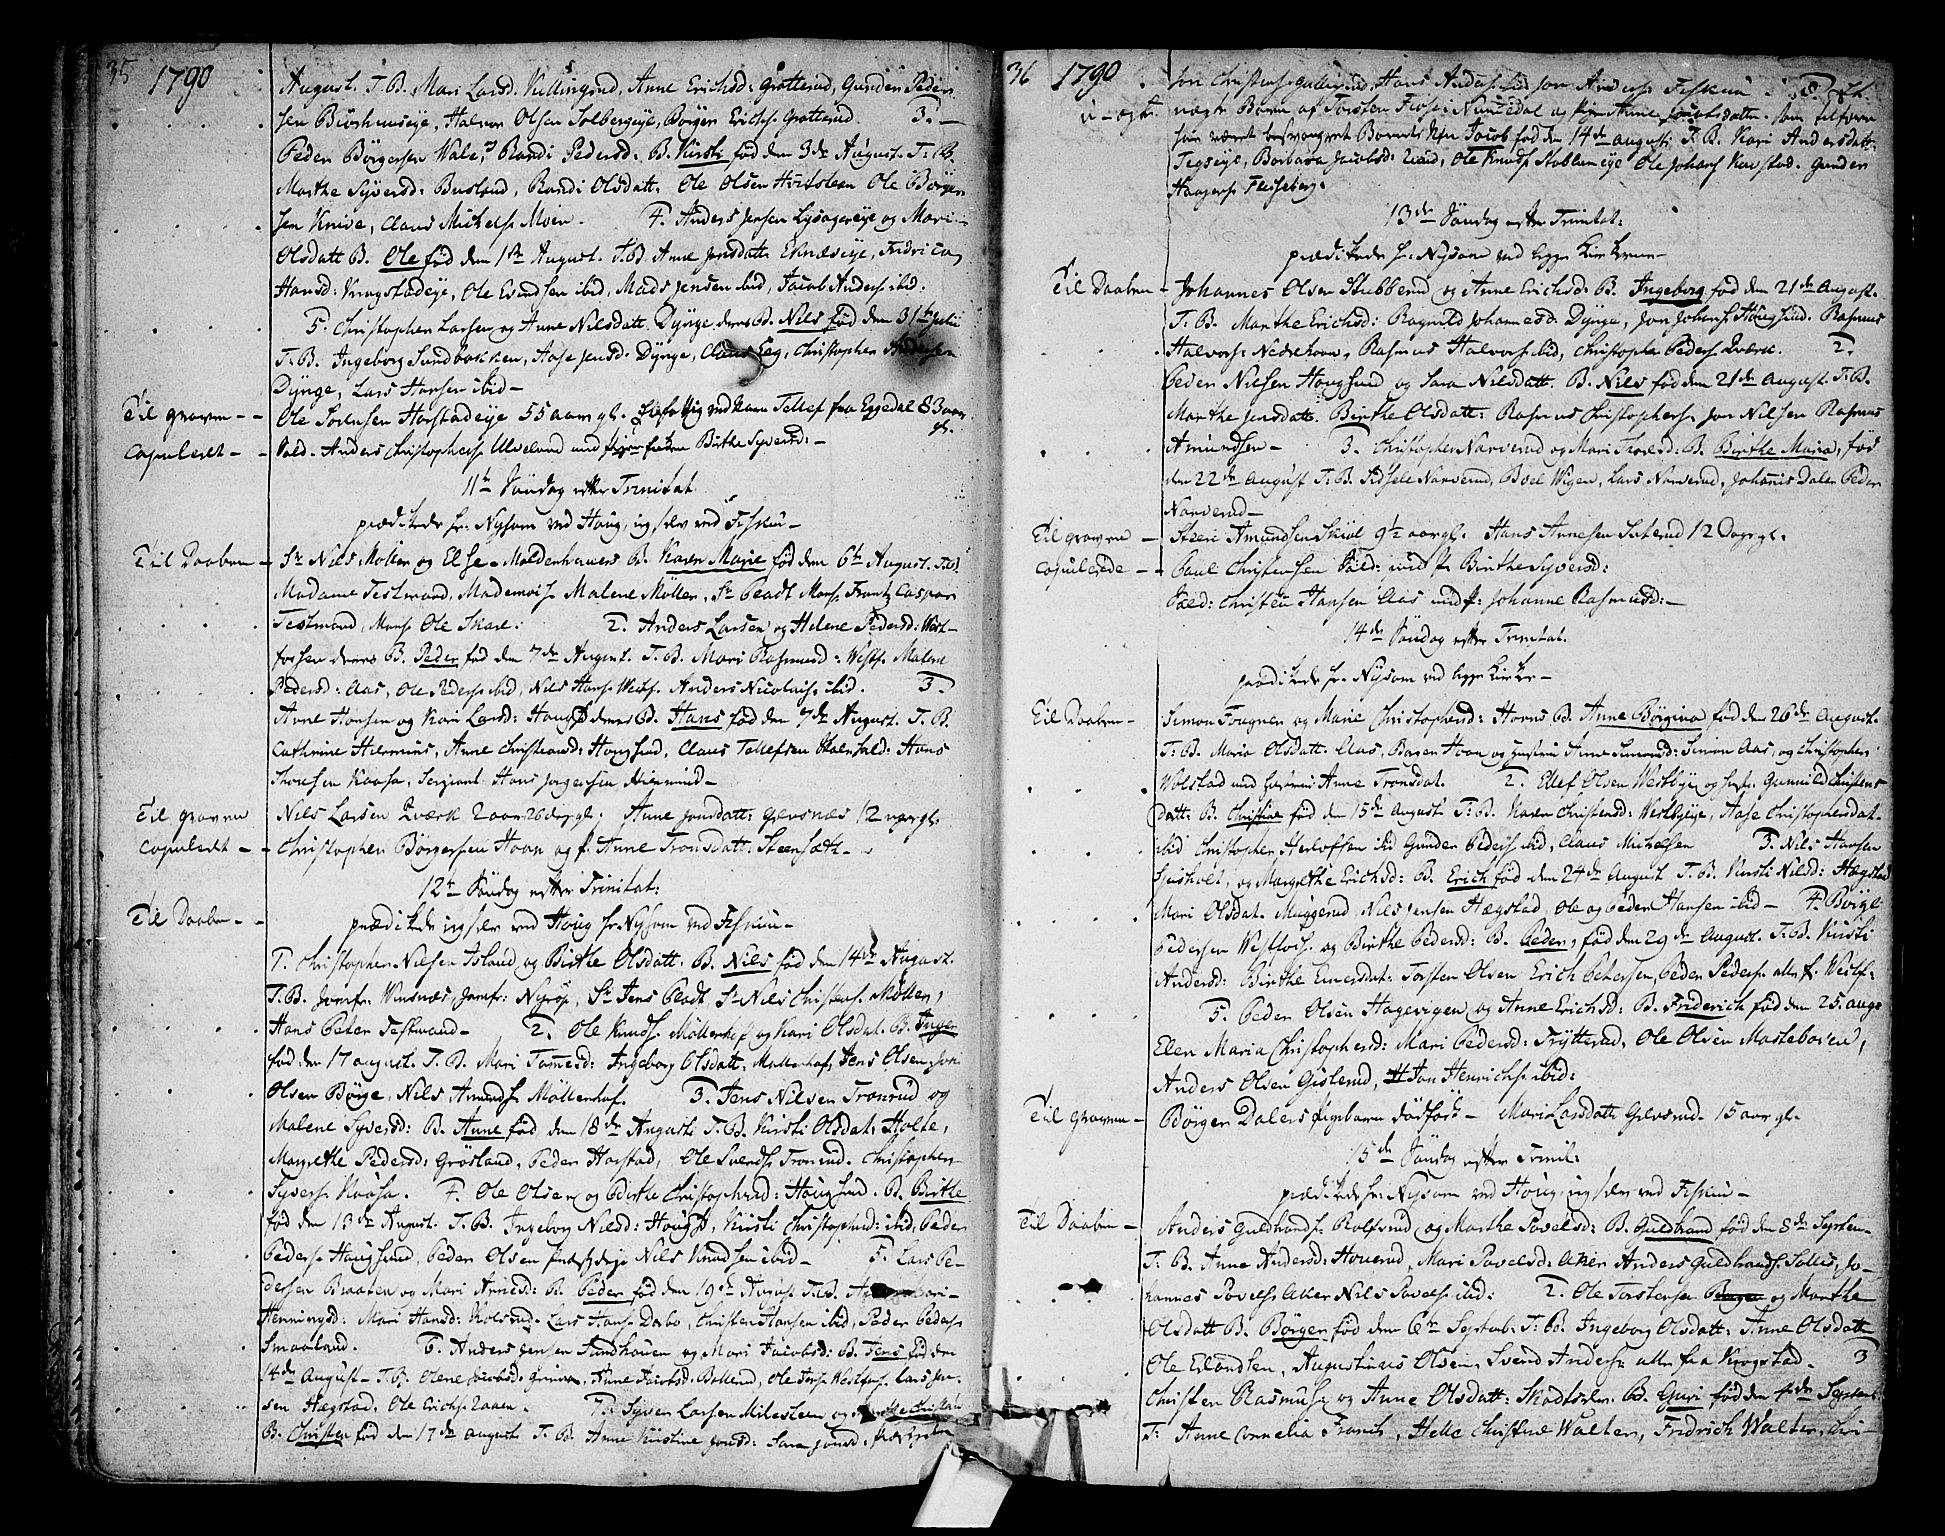 SAKO, Eiker kirkebøker, F/Fa/L0009: Ministerialbok nr. I 9, 1789-1806, s. 35-36